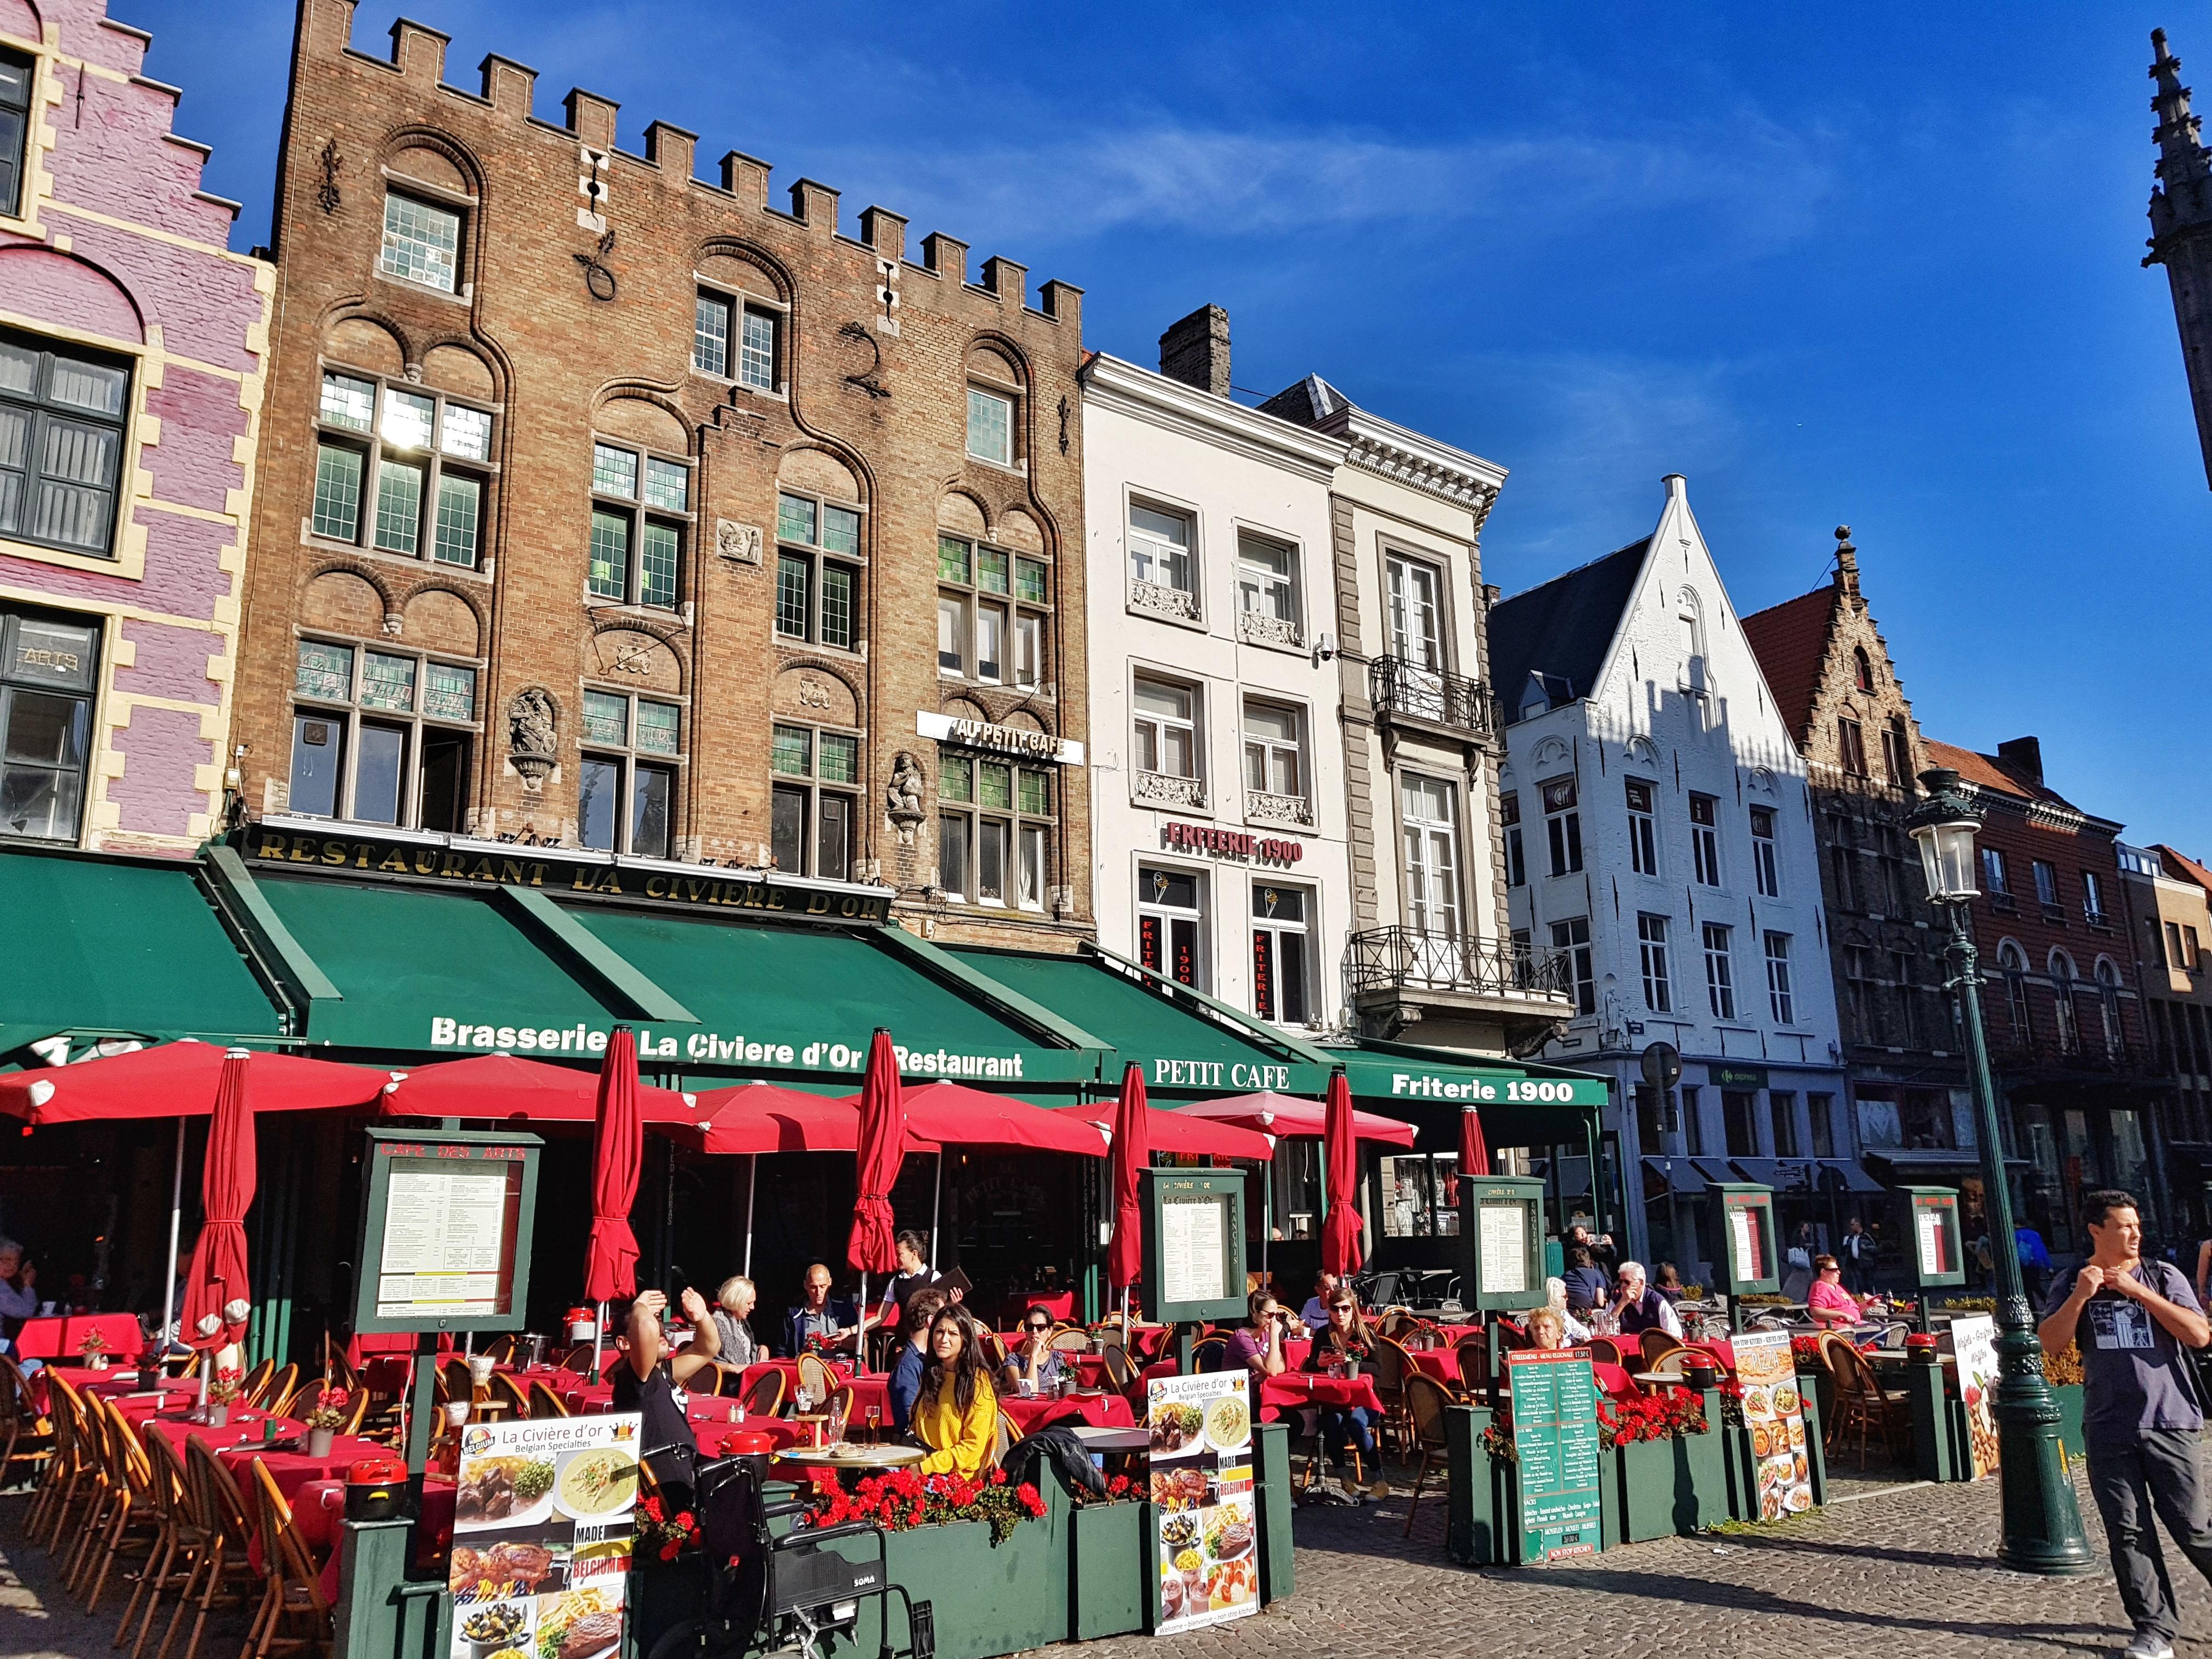 ColorfulHouses_Belgium_Brugge_bruges